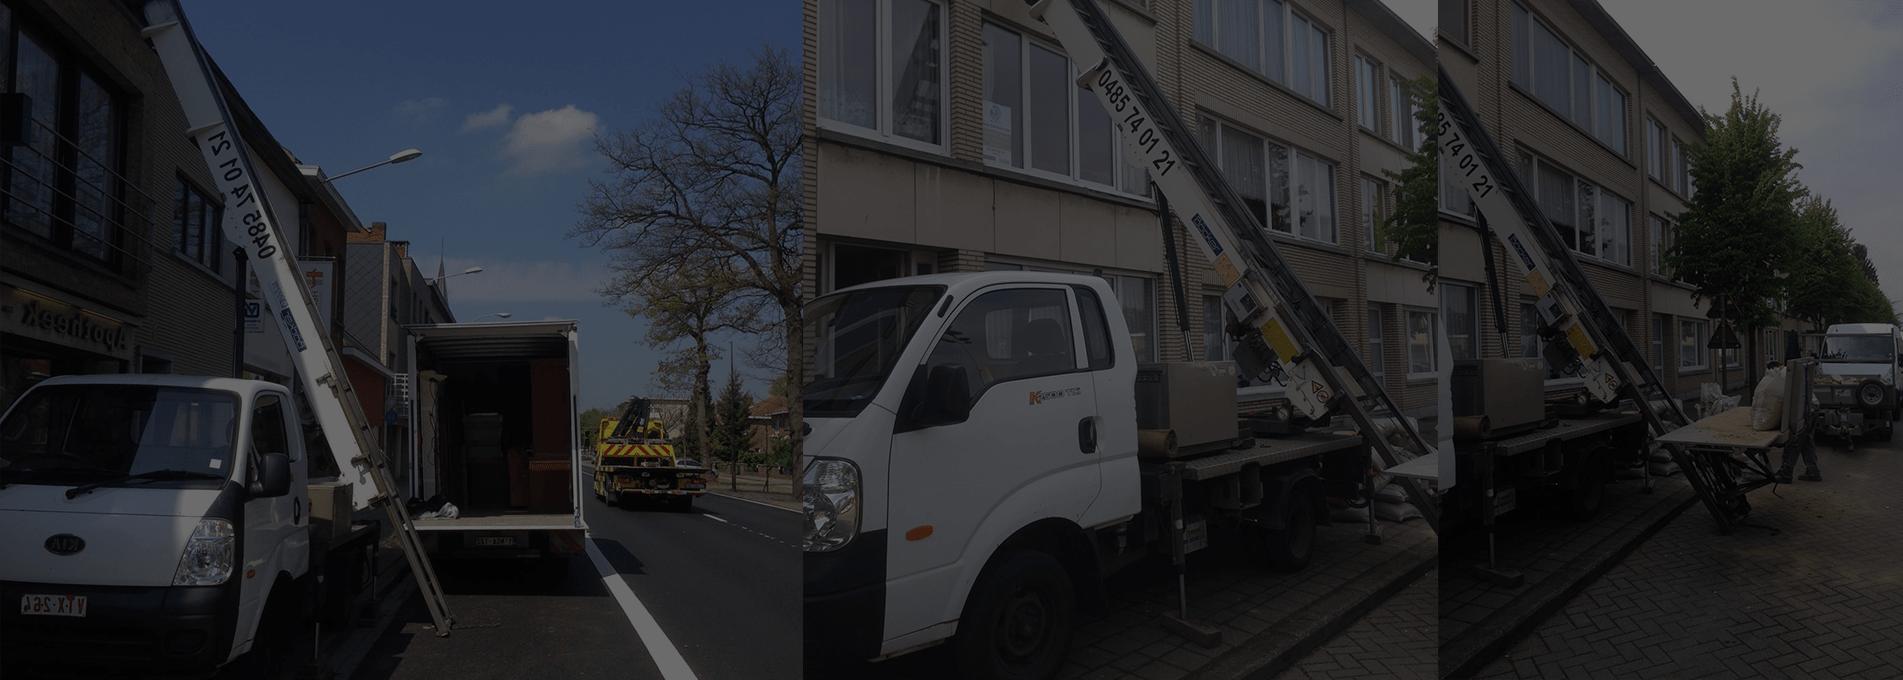 ladderlift-service-slide2-min